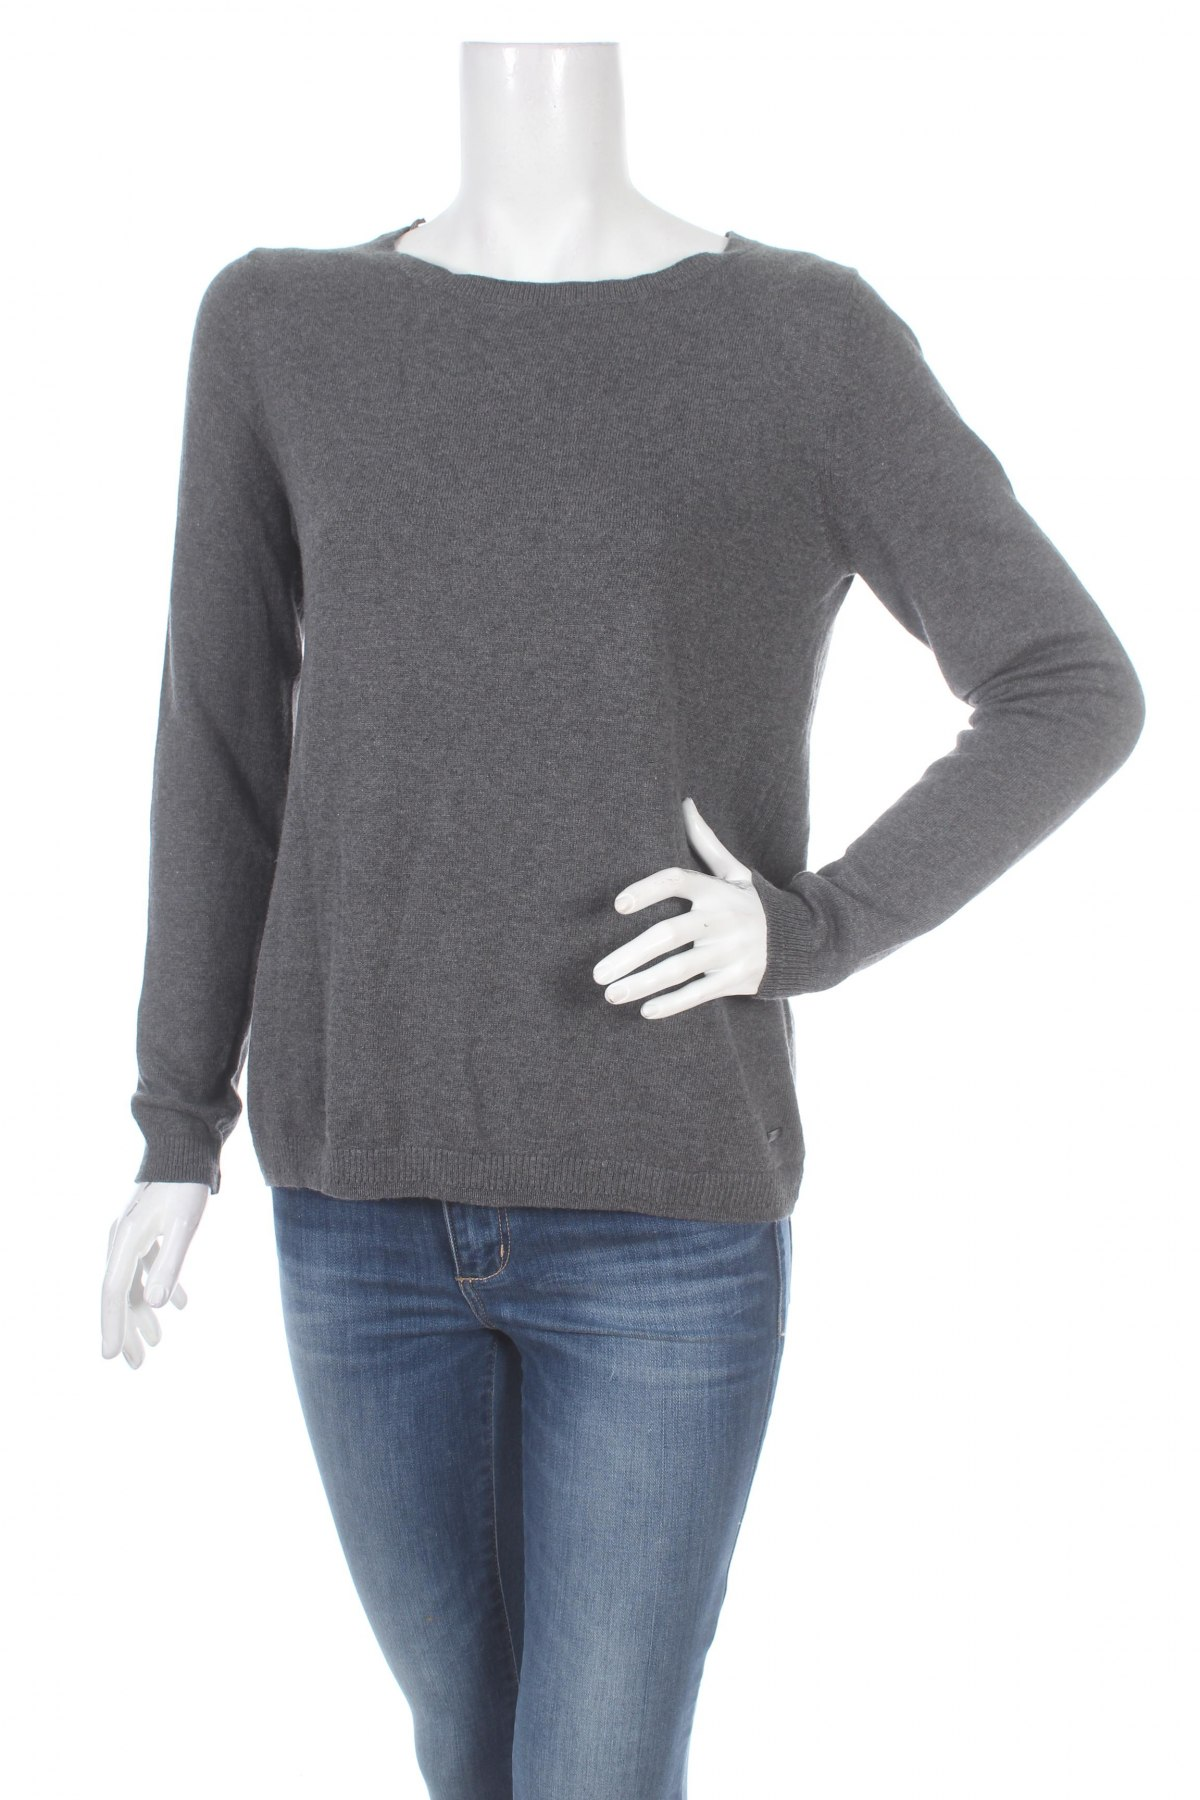 Дамски пуловер Tom Tailor, Размер S, Цвят Сив, 50% памук, 25% вискоза, 20% полиамид, 5% кашмир, Цена 44,20лв.